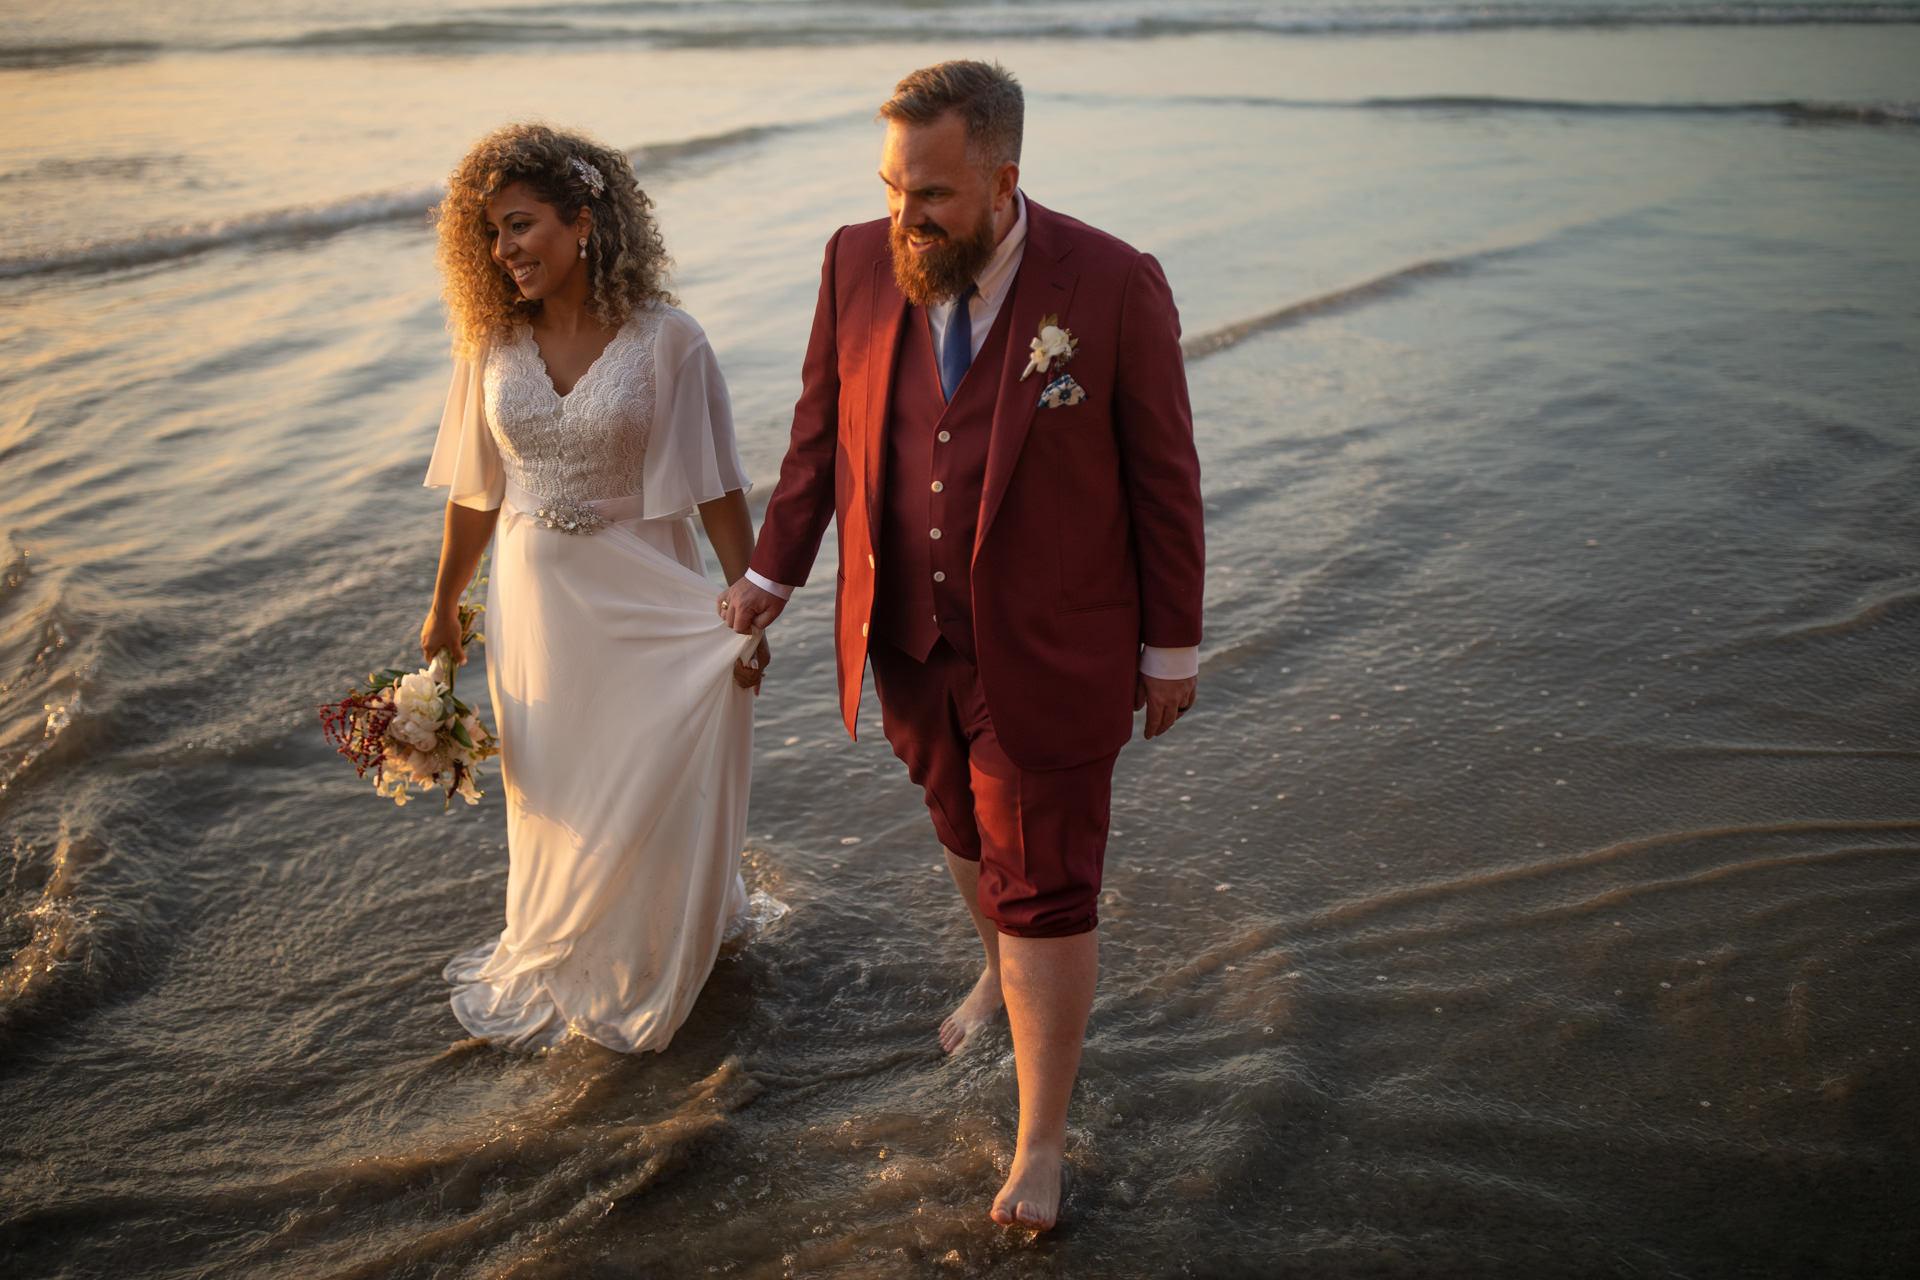 Gerusa Eric La Jolla San Diego Beach Wedding by Faces Photography